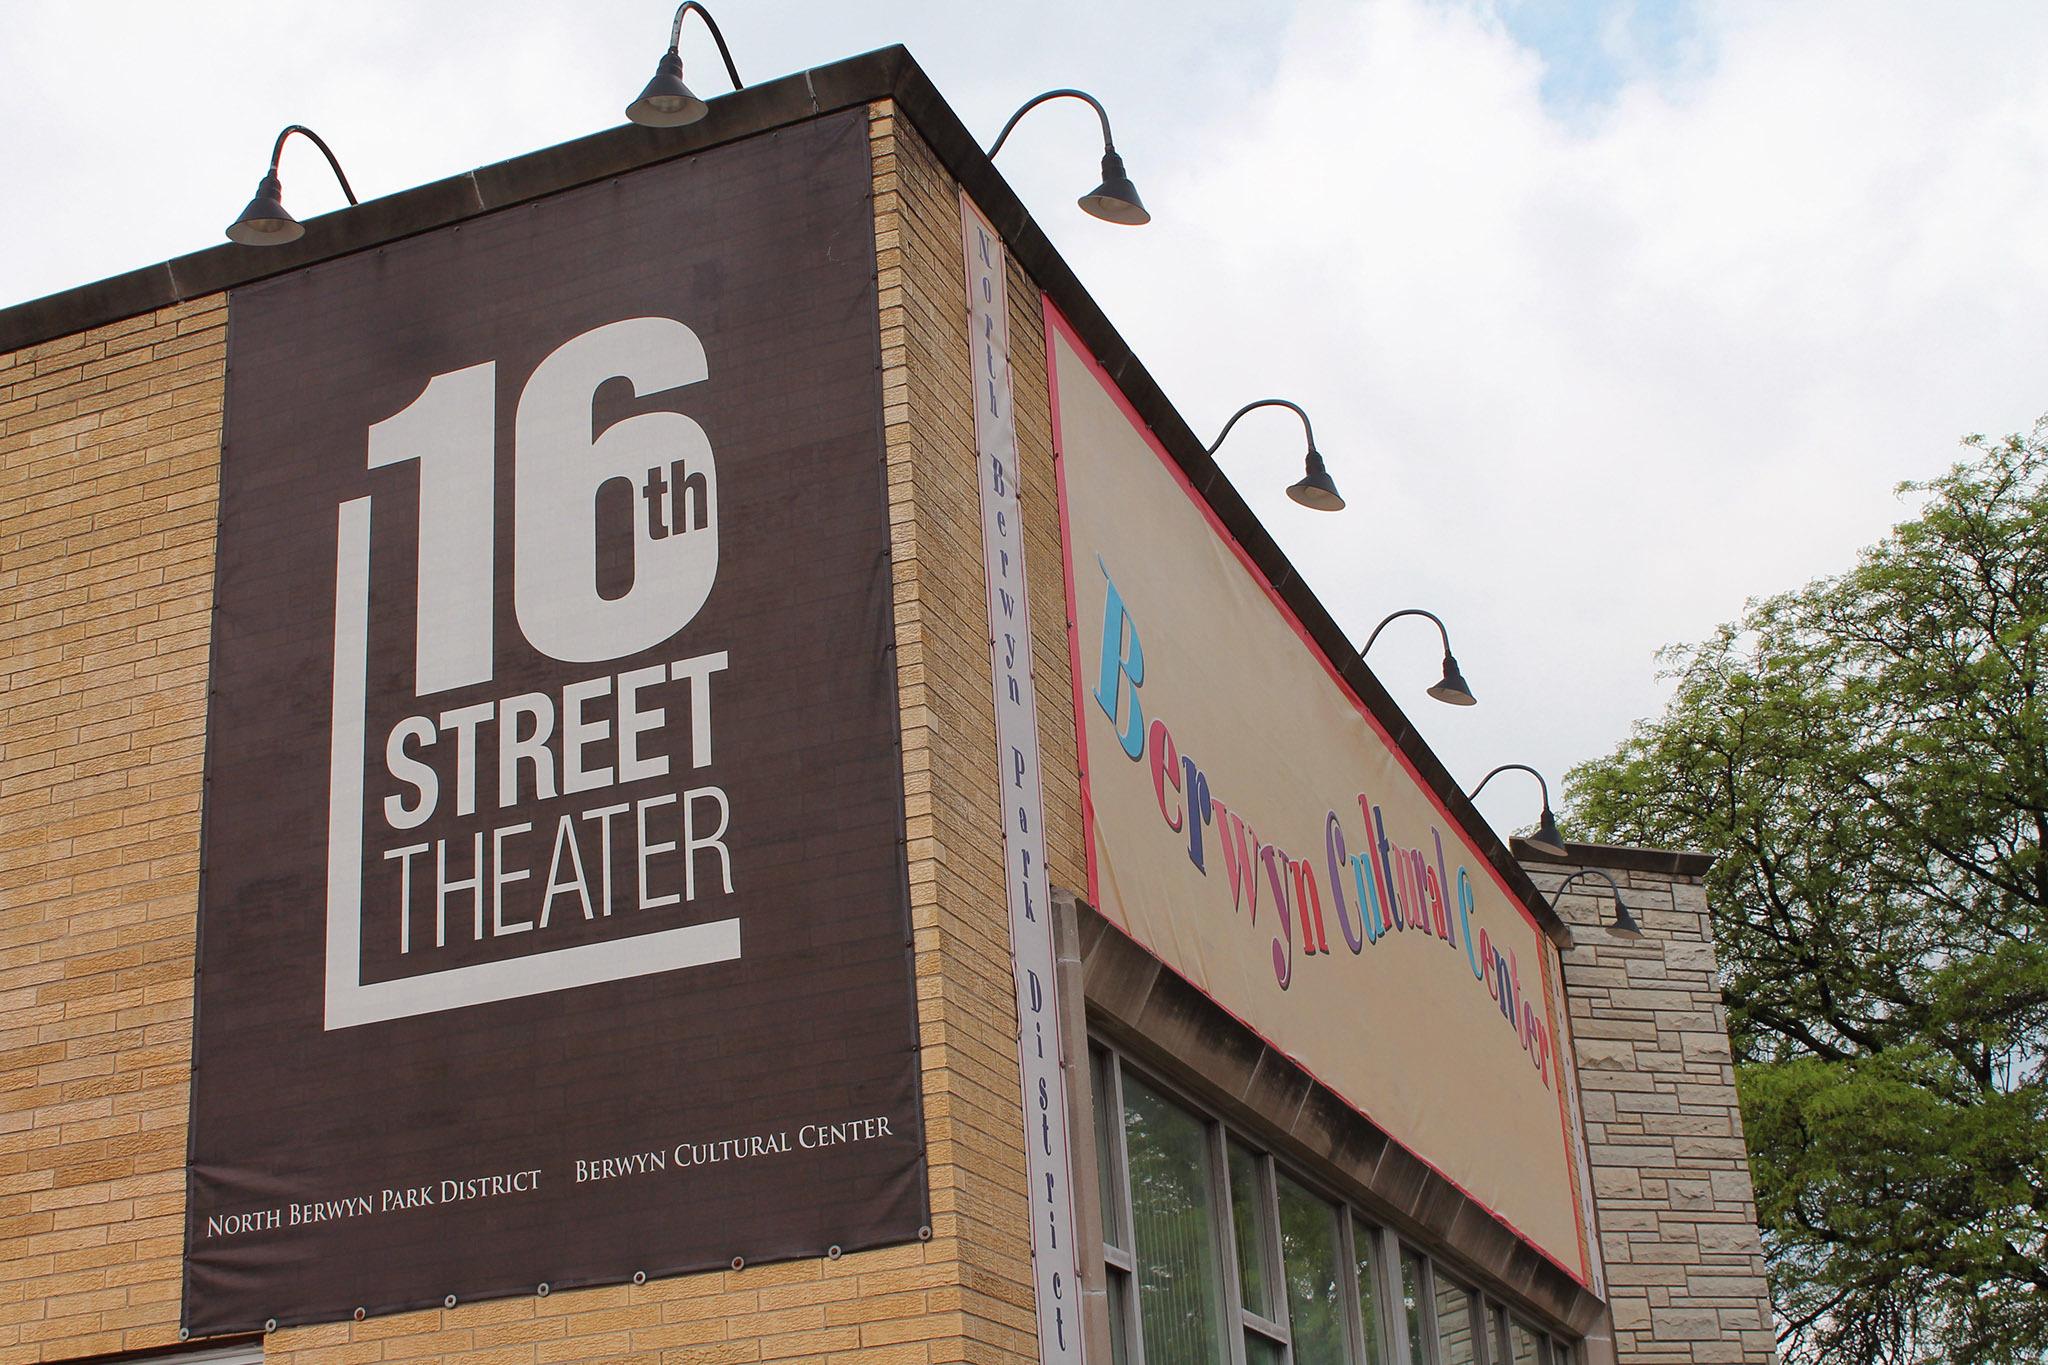 16thStreetTheater.Venue.jpg